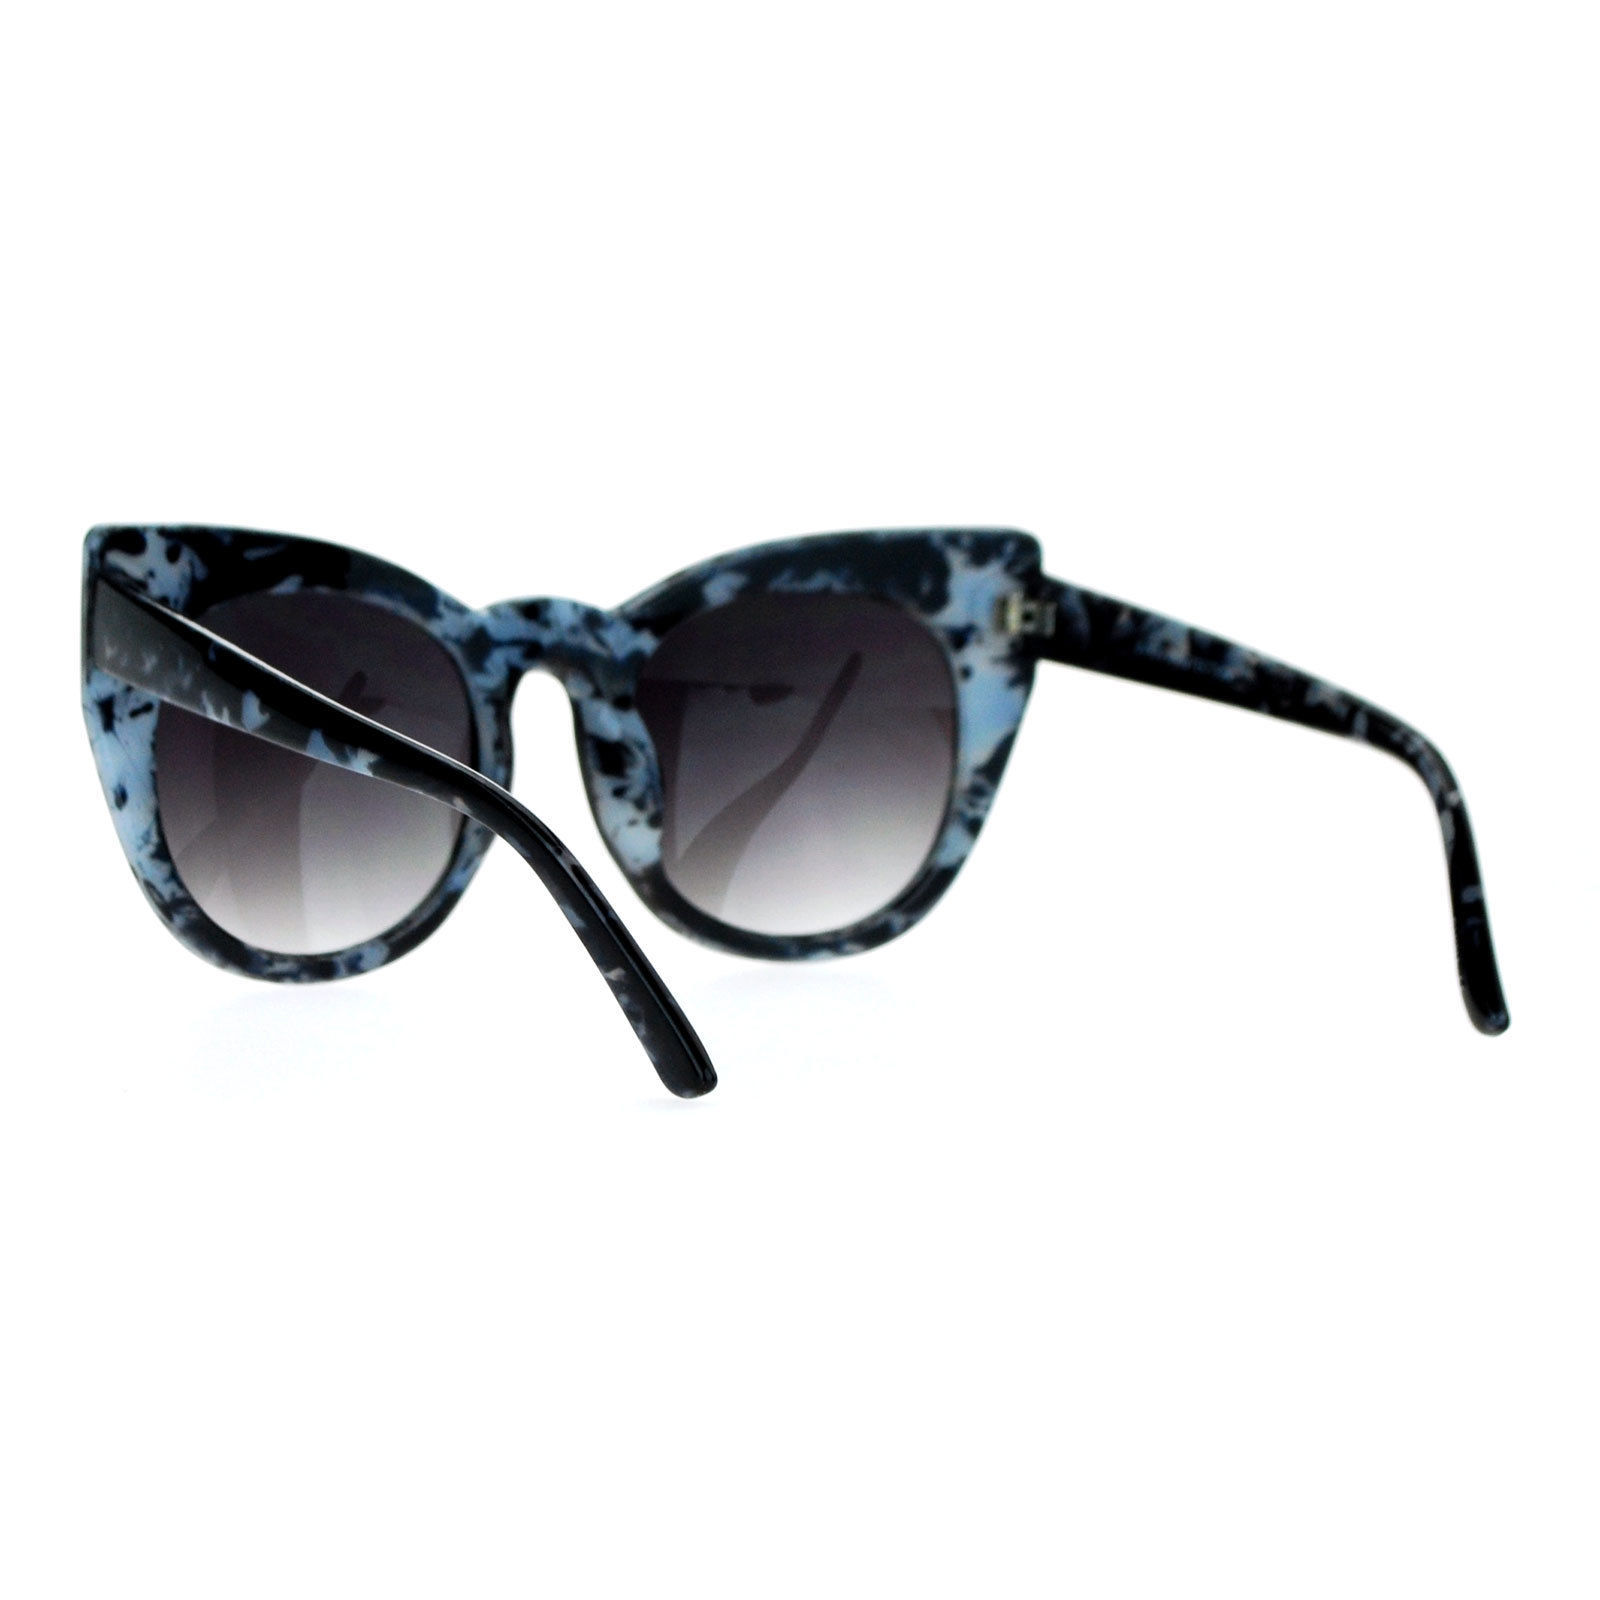 SA106 Womens Oversize Round Cat Eye Tip Comic Casual Diva Runway Sunglasses